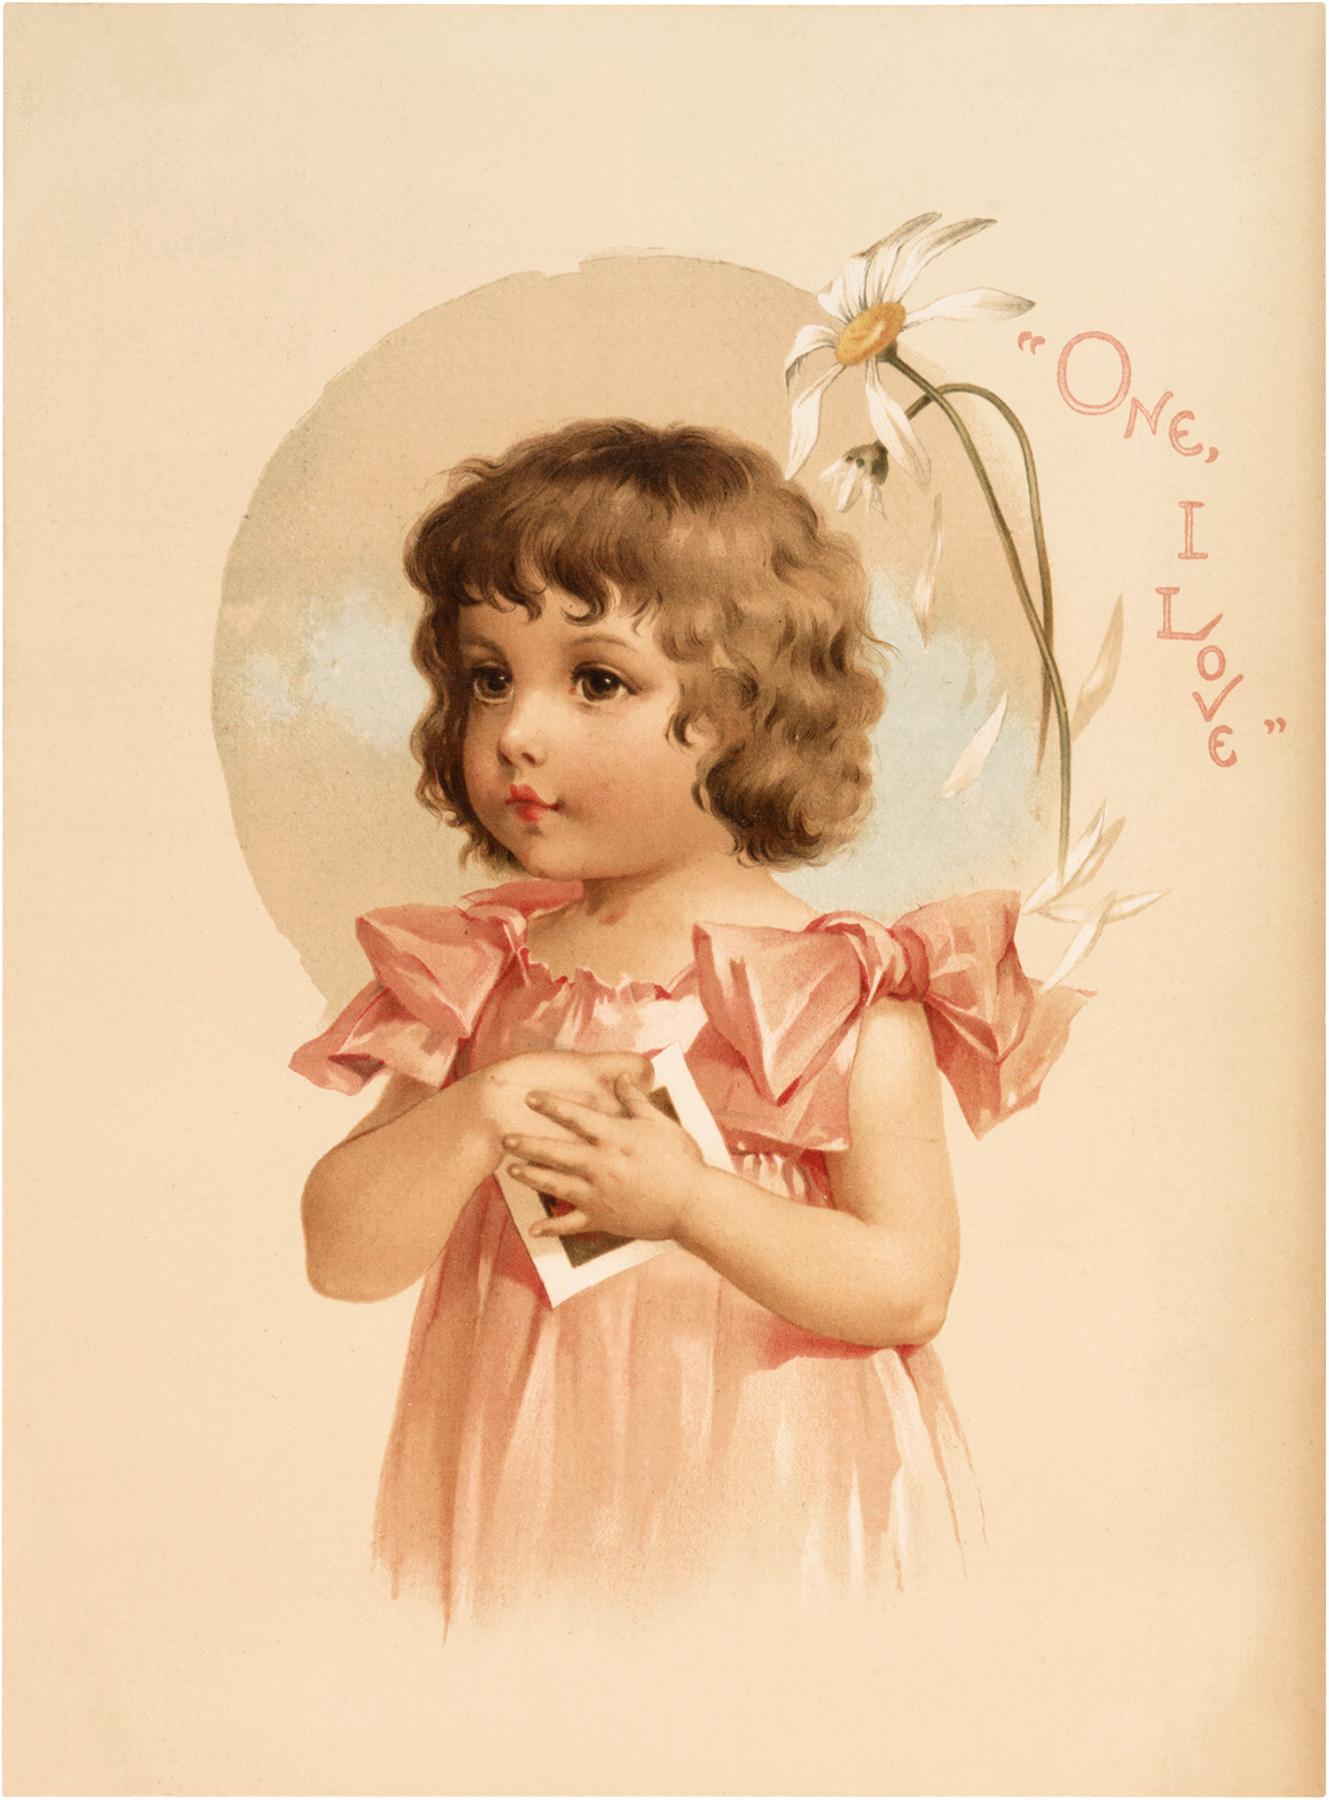 Vintage little girls clipart pink & orange image royalty free stock 10 Valentine Children Images! - The Graphics Fairy image royalty free stock